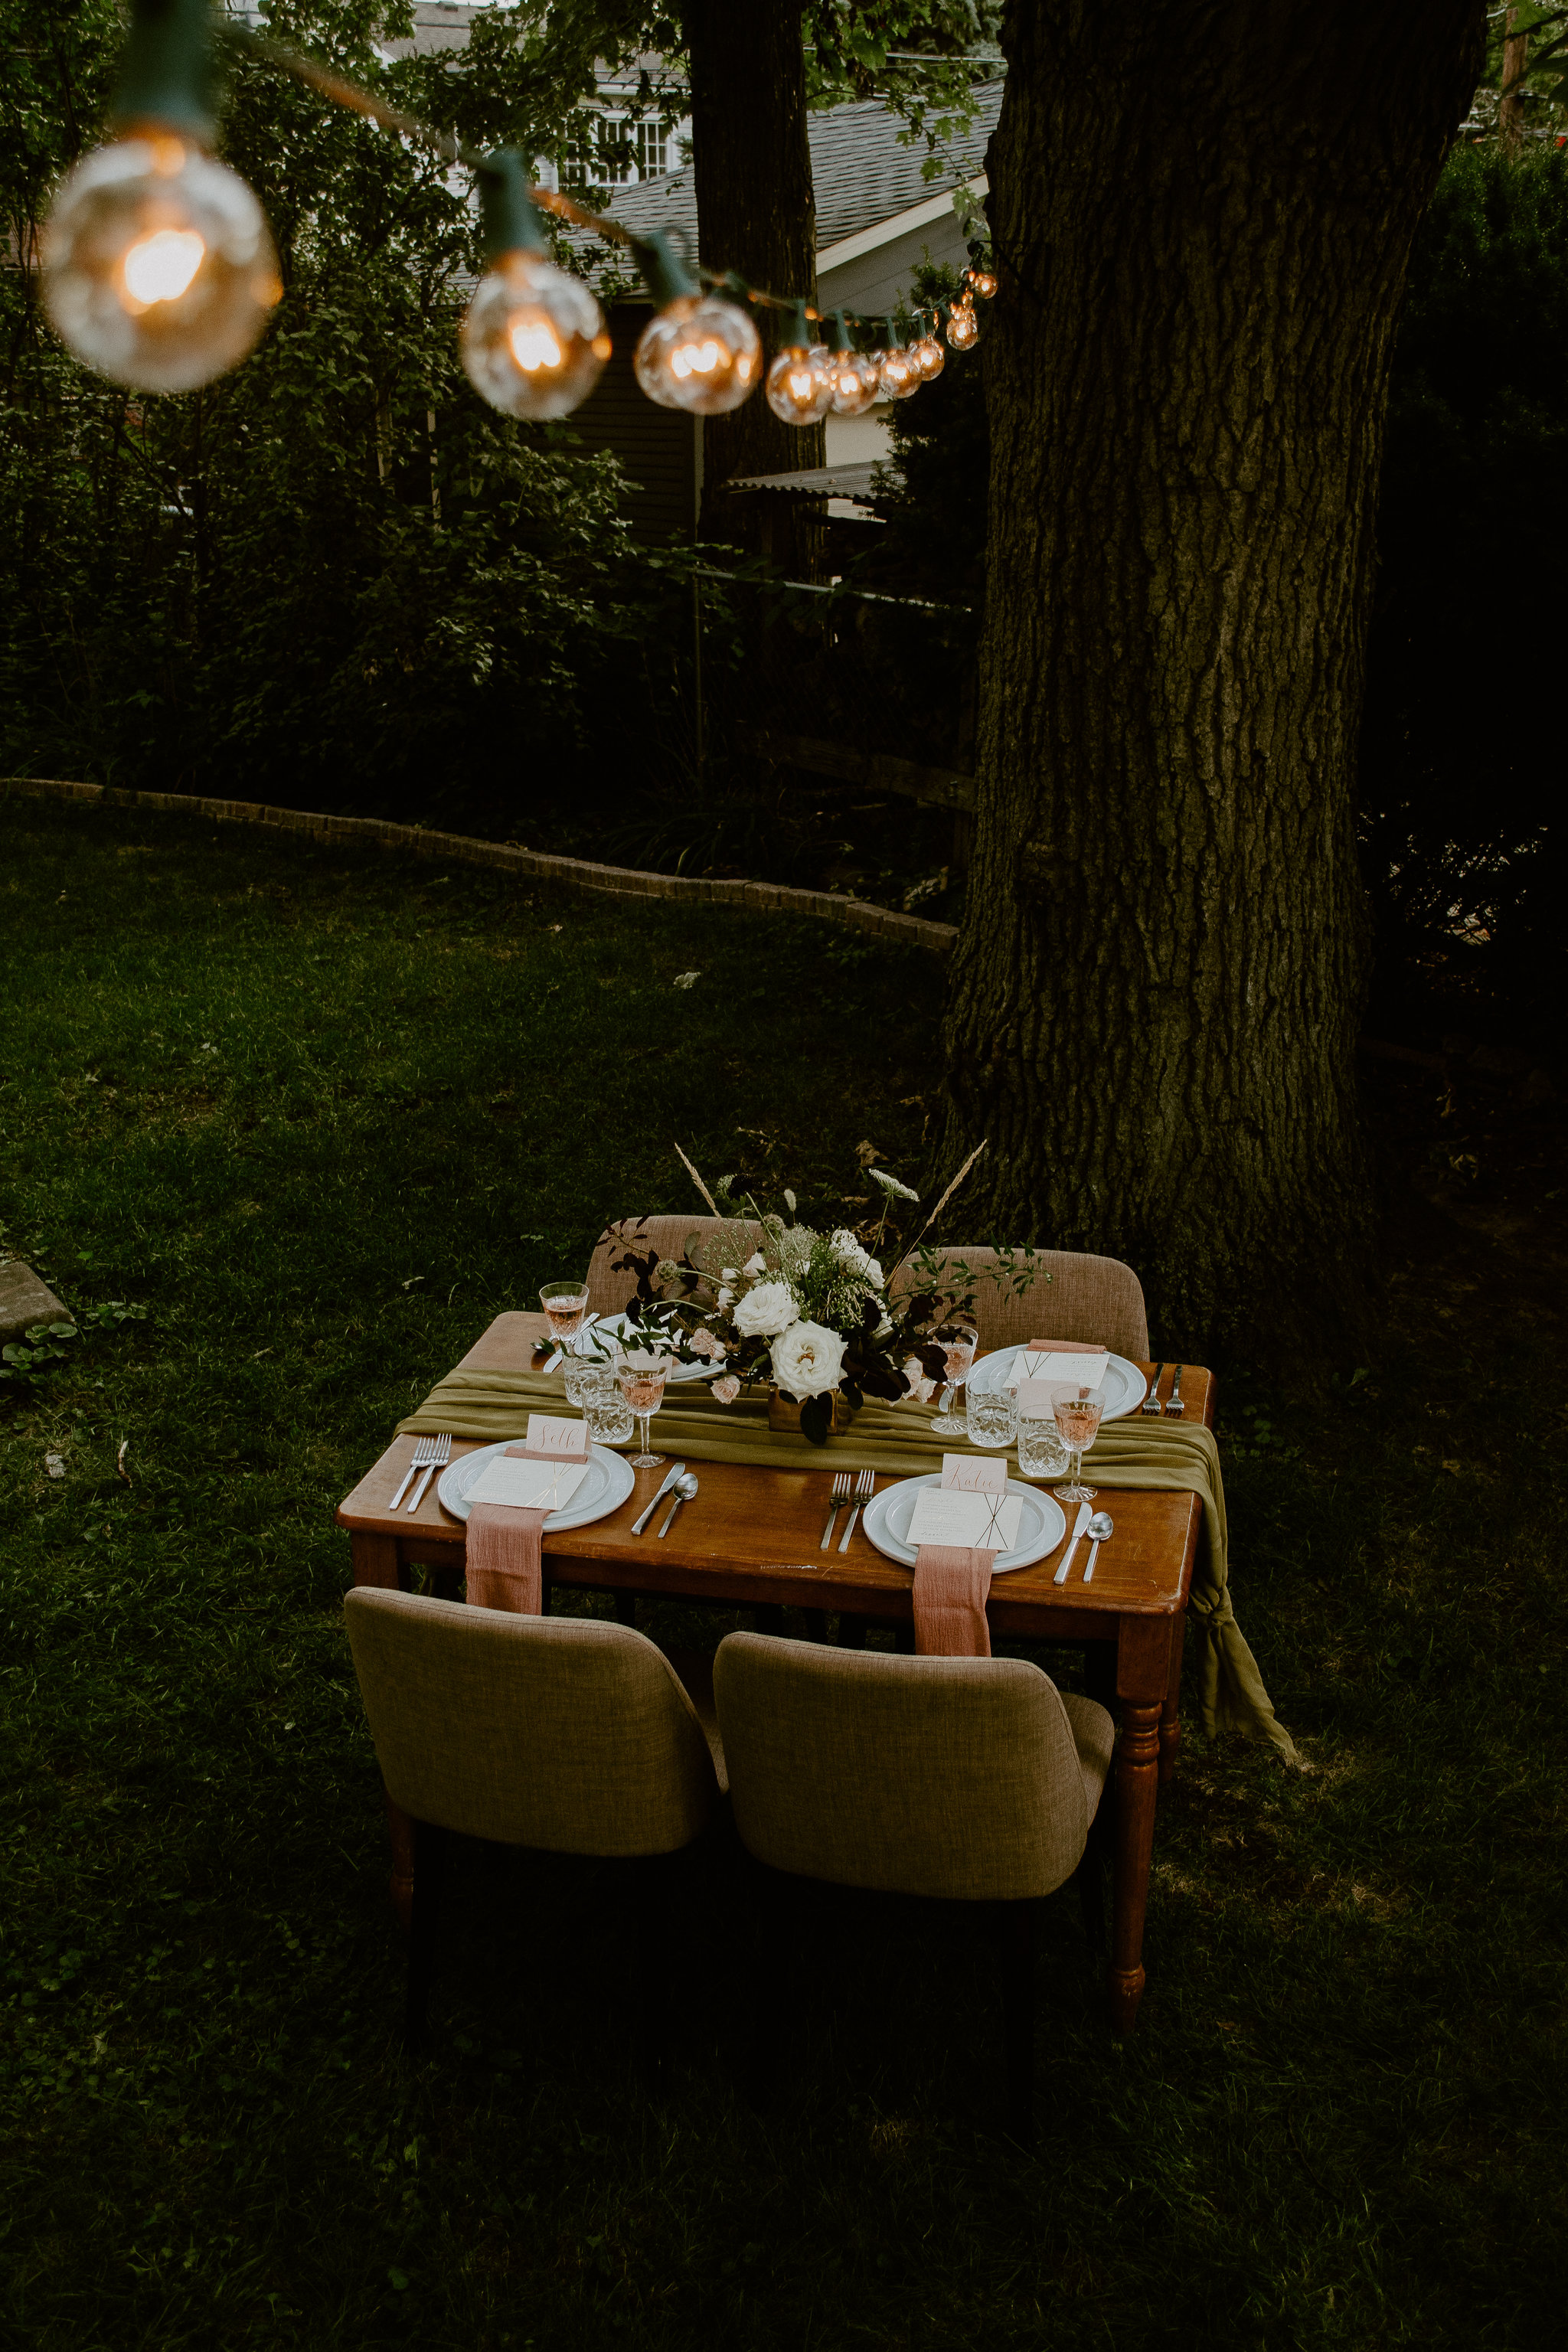 chartreuse-table-setup-with-hanging-lights.jpg